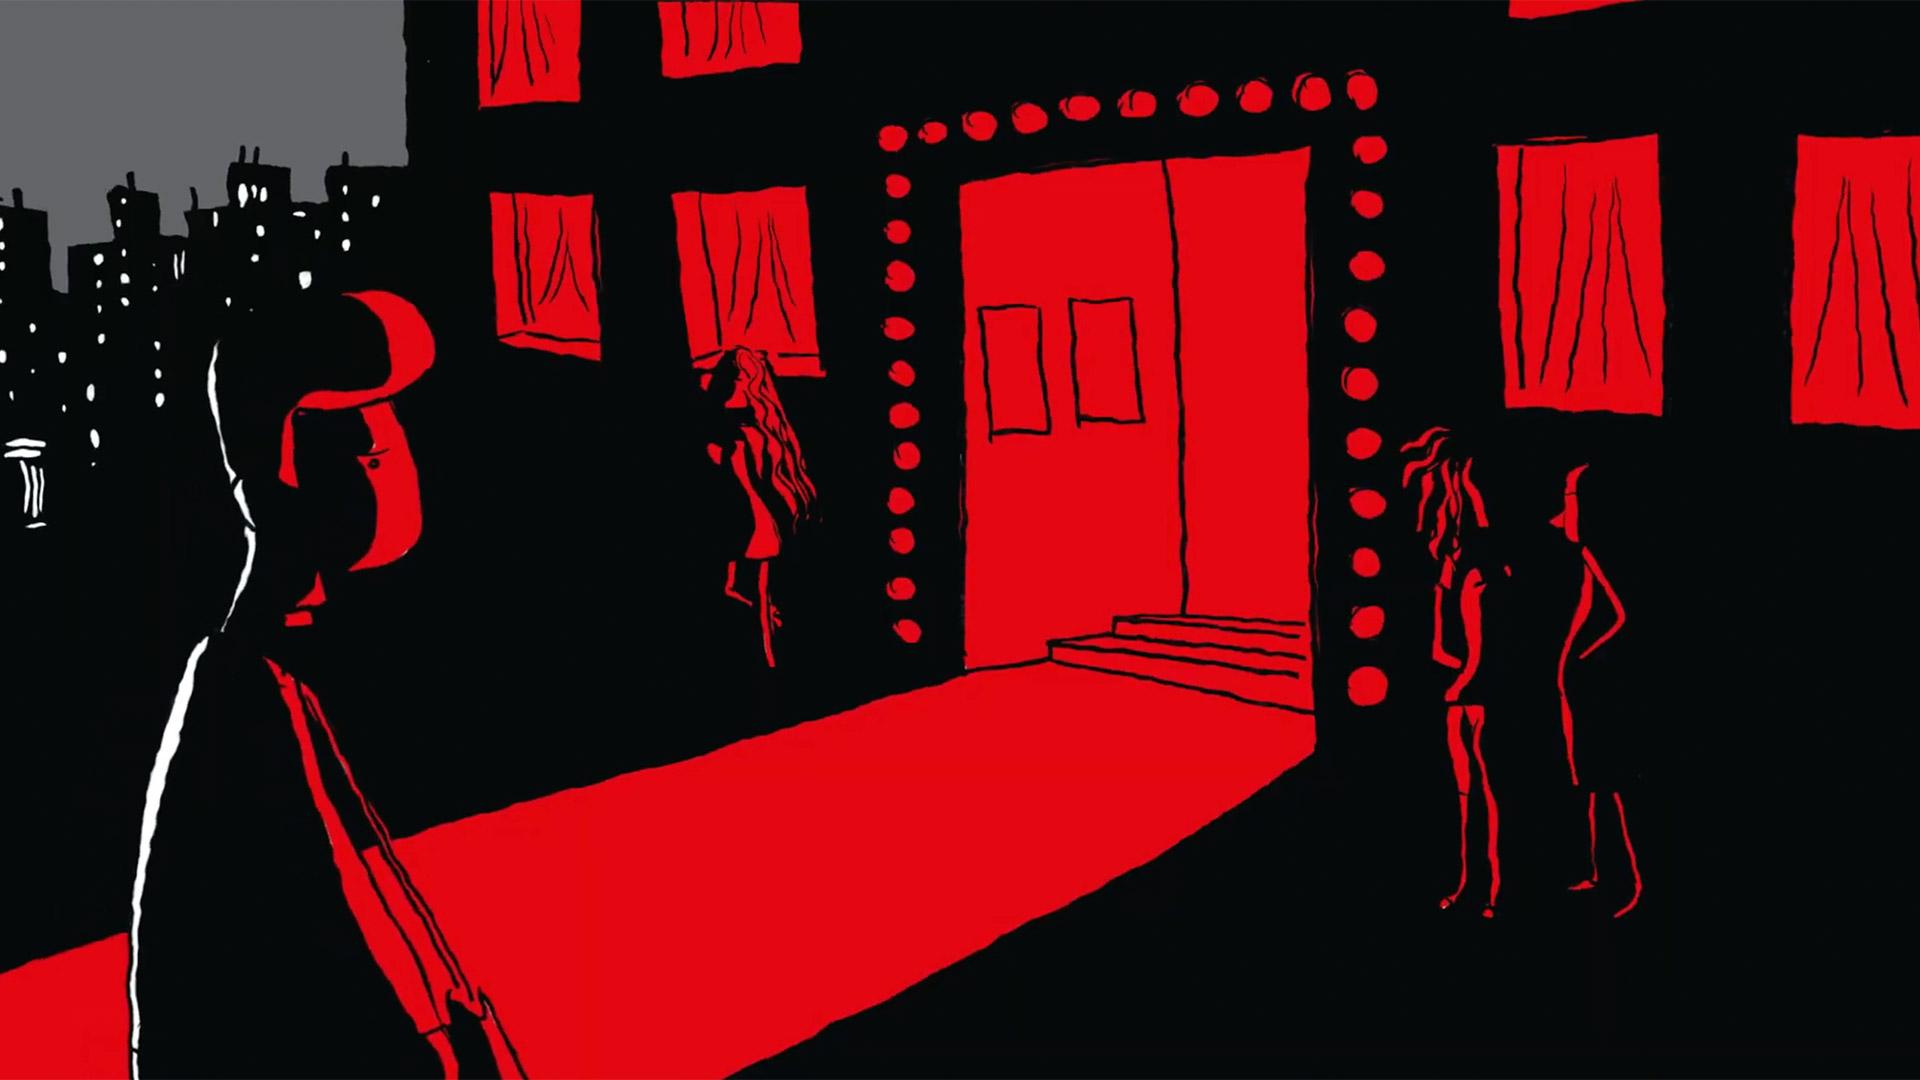 portfolio-xes-zdf-aspekte-beitrag-zum-thema-sexsucht-animation-animationsstudio